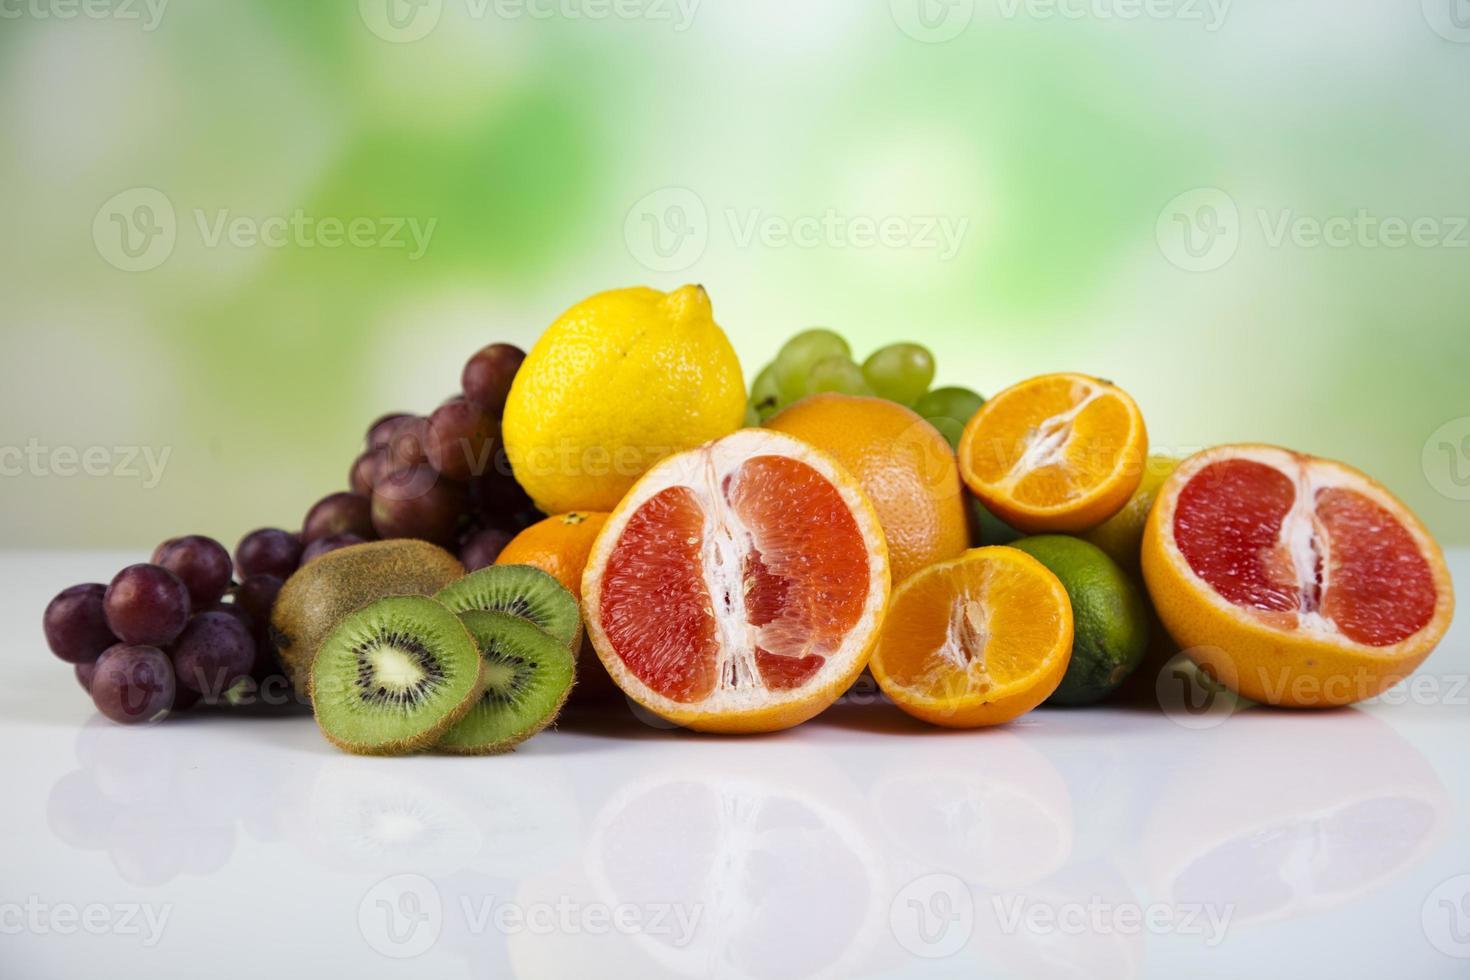 fruit, groenten, vruchtensappen, groentesappen, gezonde voeding foto